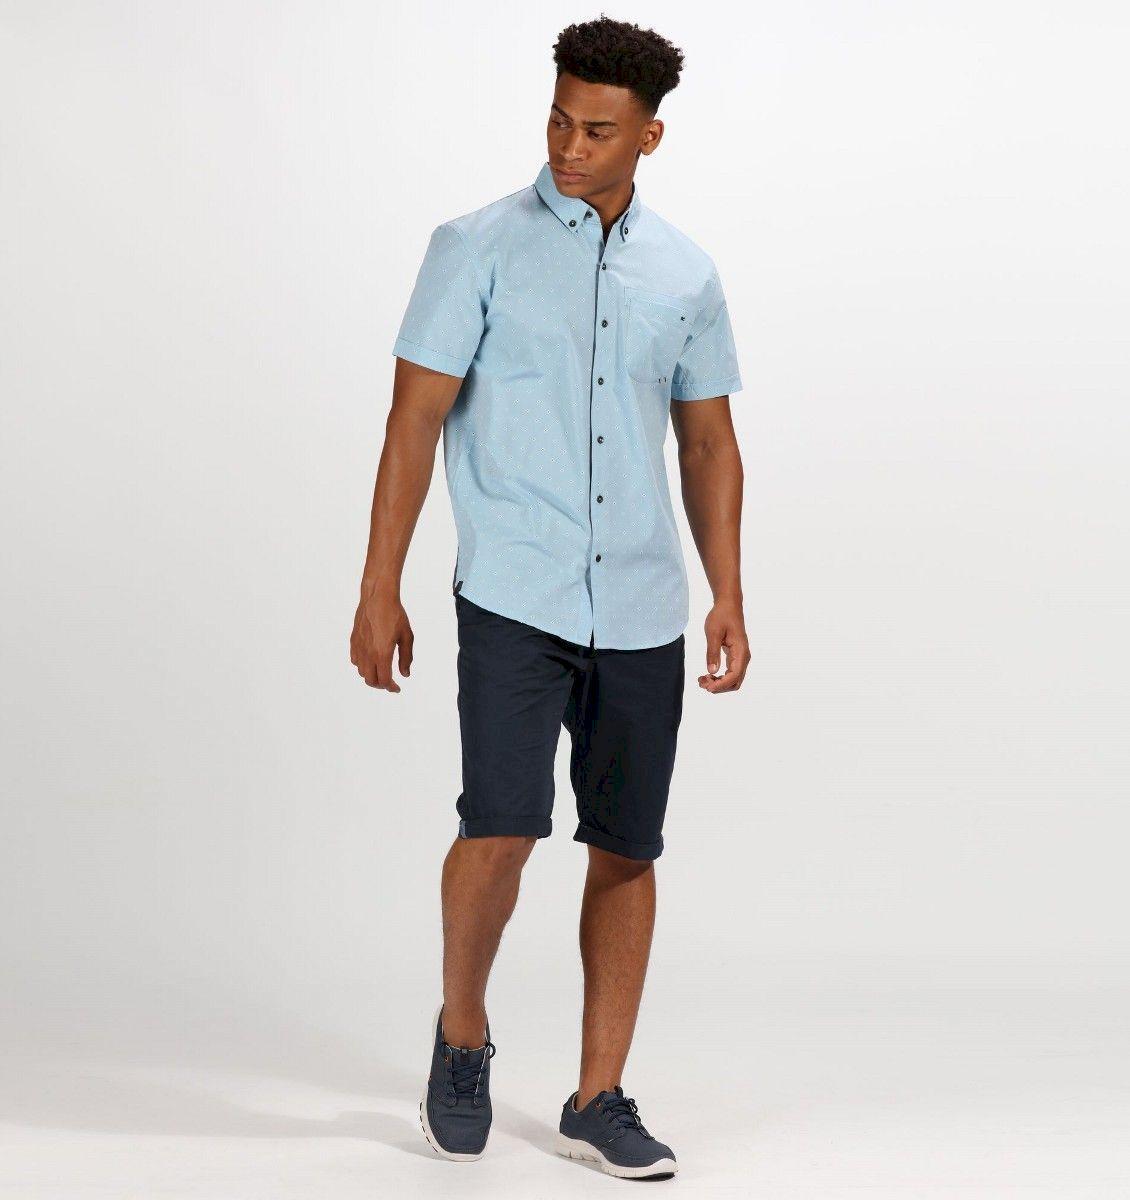 Рубашка мужская Regatta Damaso, цвет: синий. RMS119-9WM. Размер XL (56)RMS119-9WM100% Coolweave хлопок с рисунком/ 65% хлопок / 35% полиэстер, меланж. 1 карман на груди.